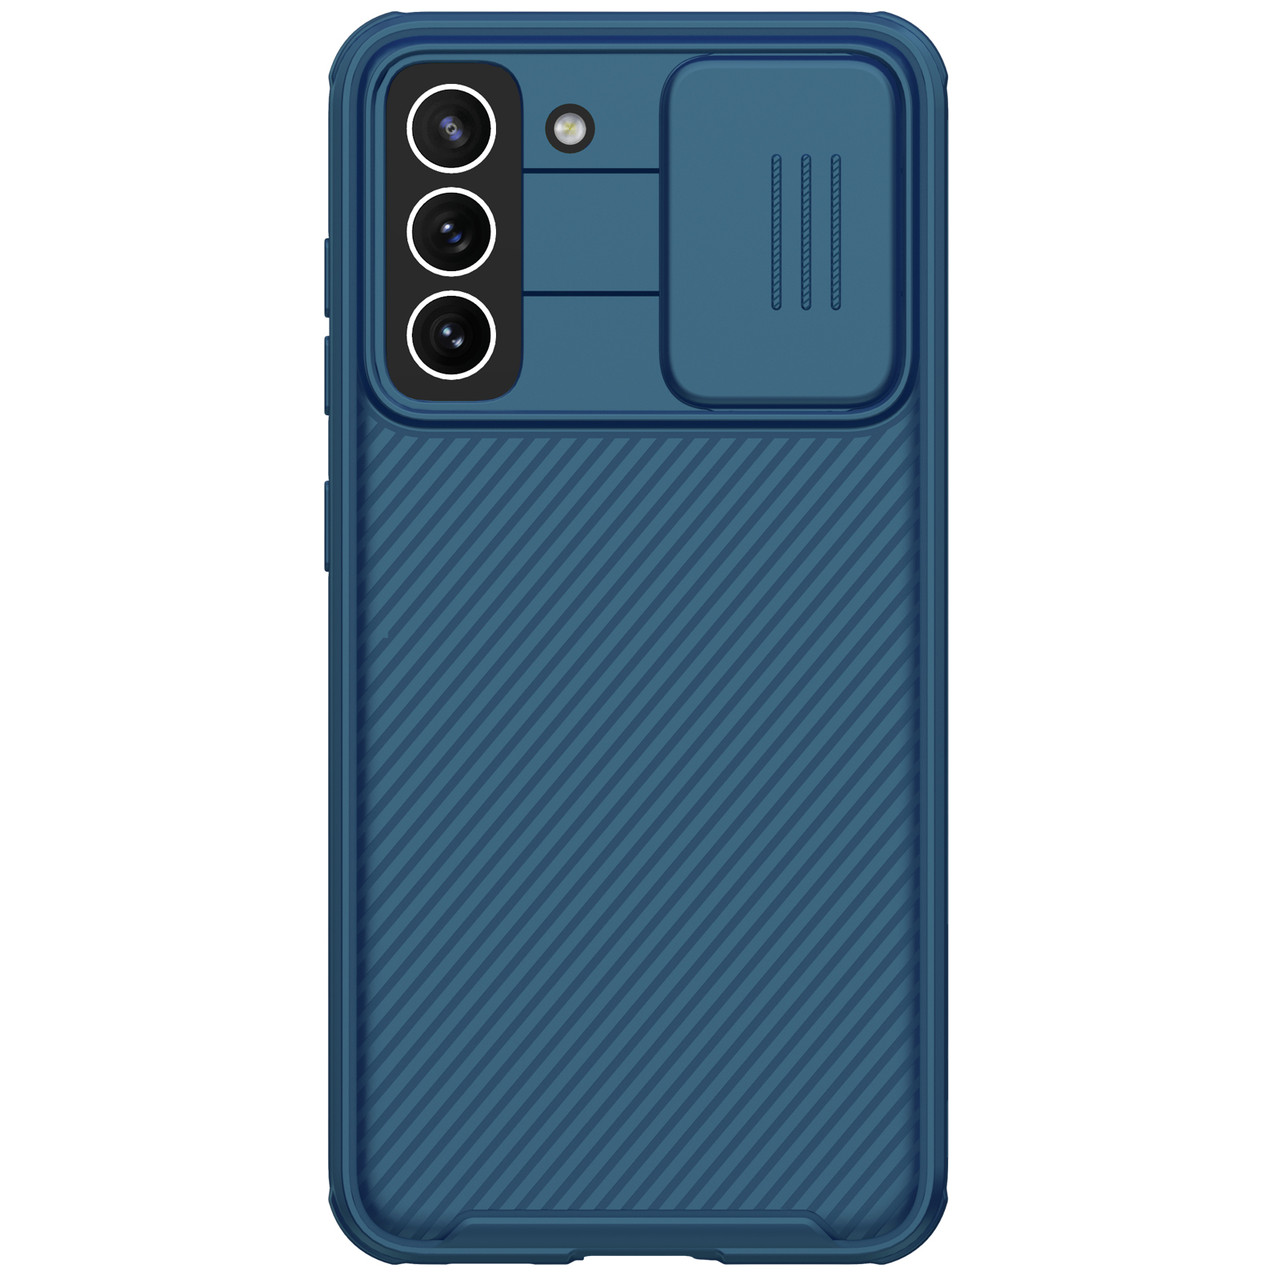 Защитный чехол Nillkin для Samsung Galaxy S21 FE 2021 (CamShield Pro Case) Blue с защитой камеры